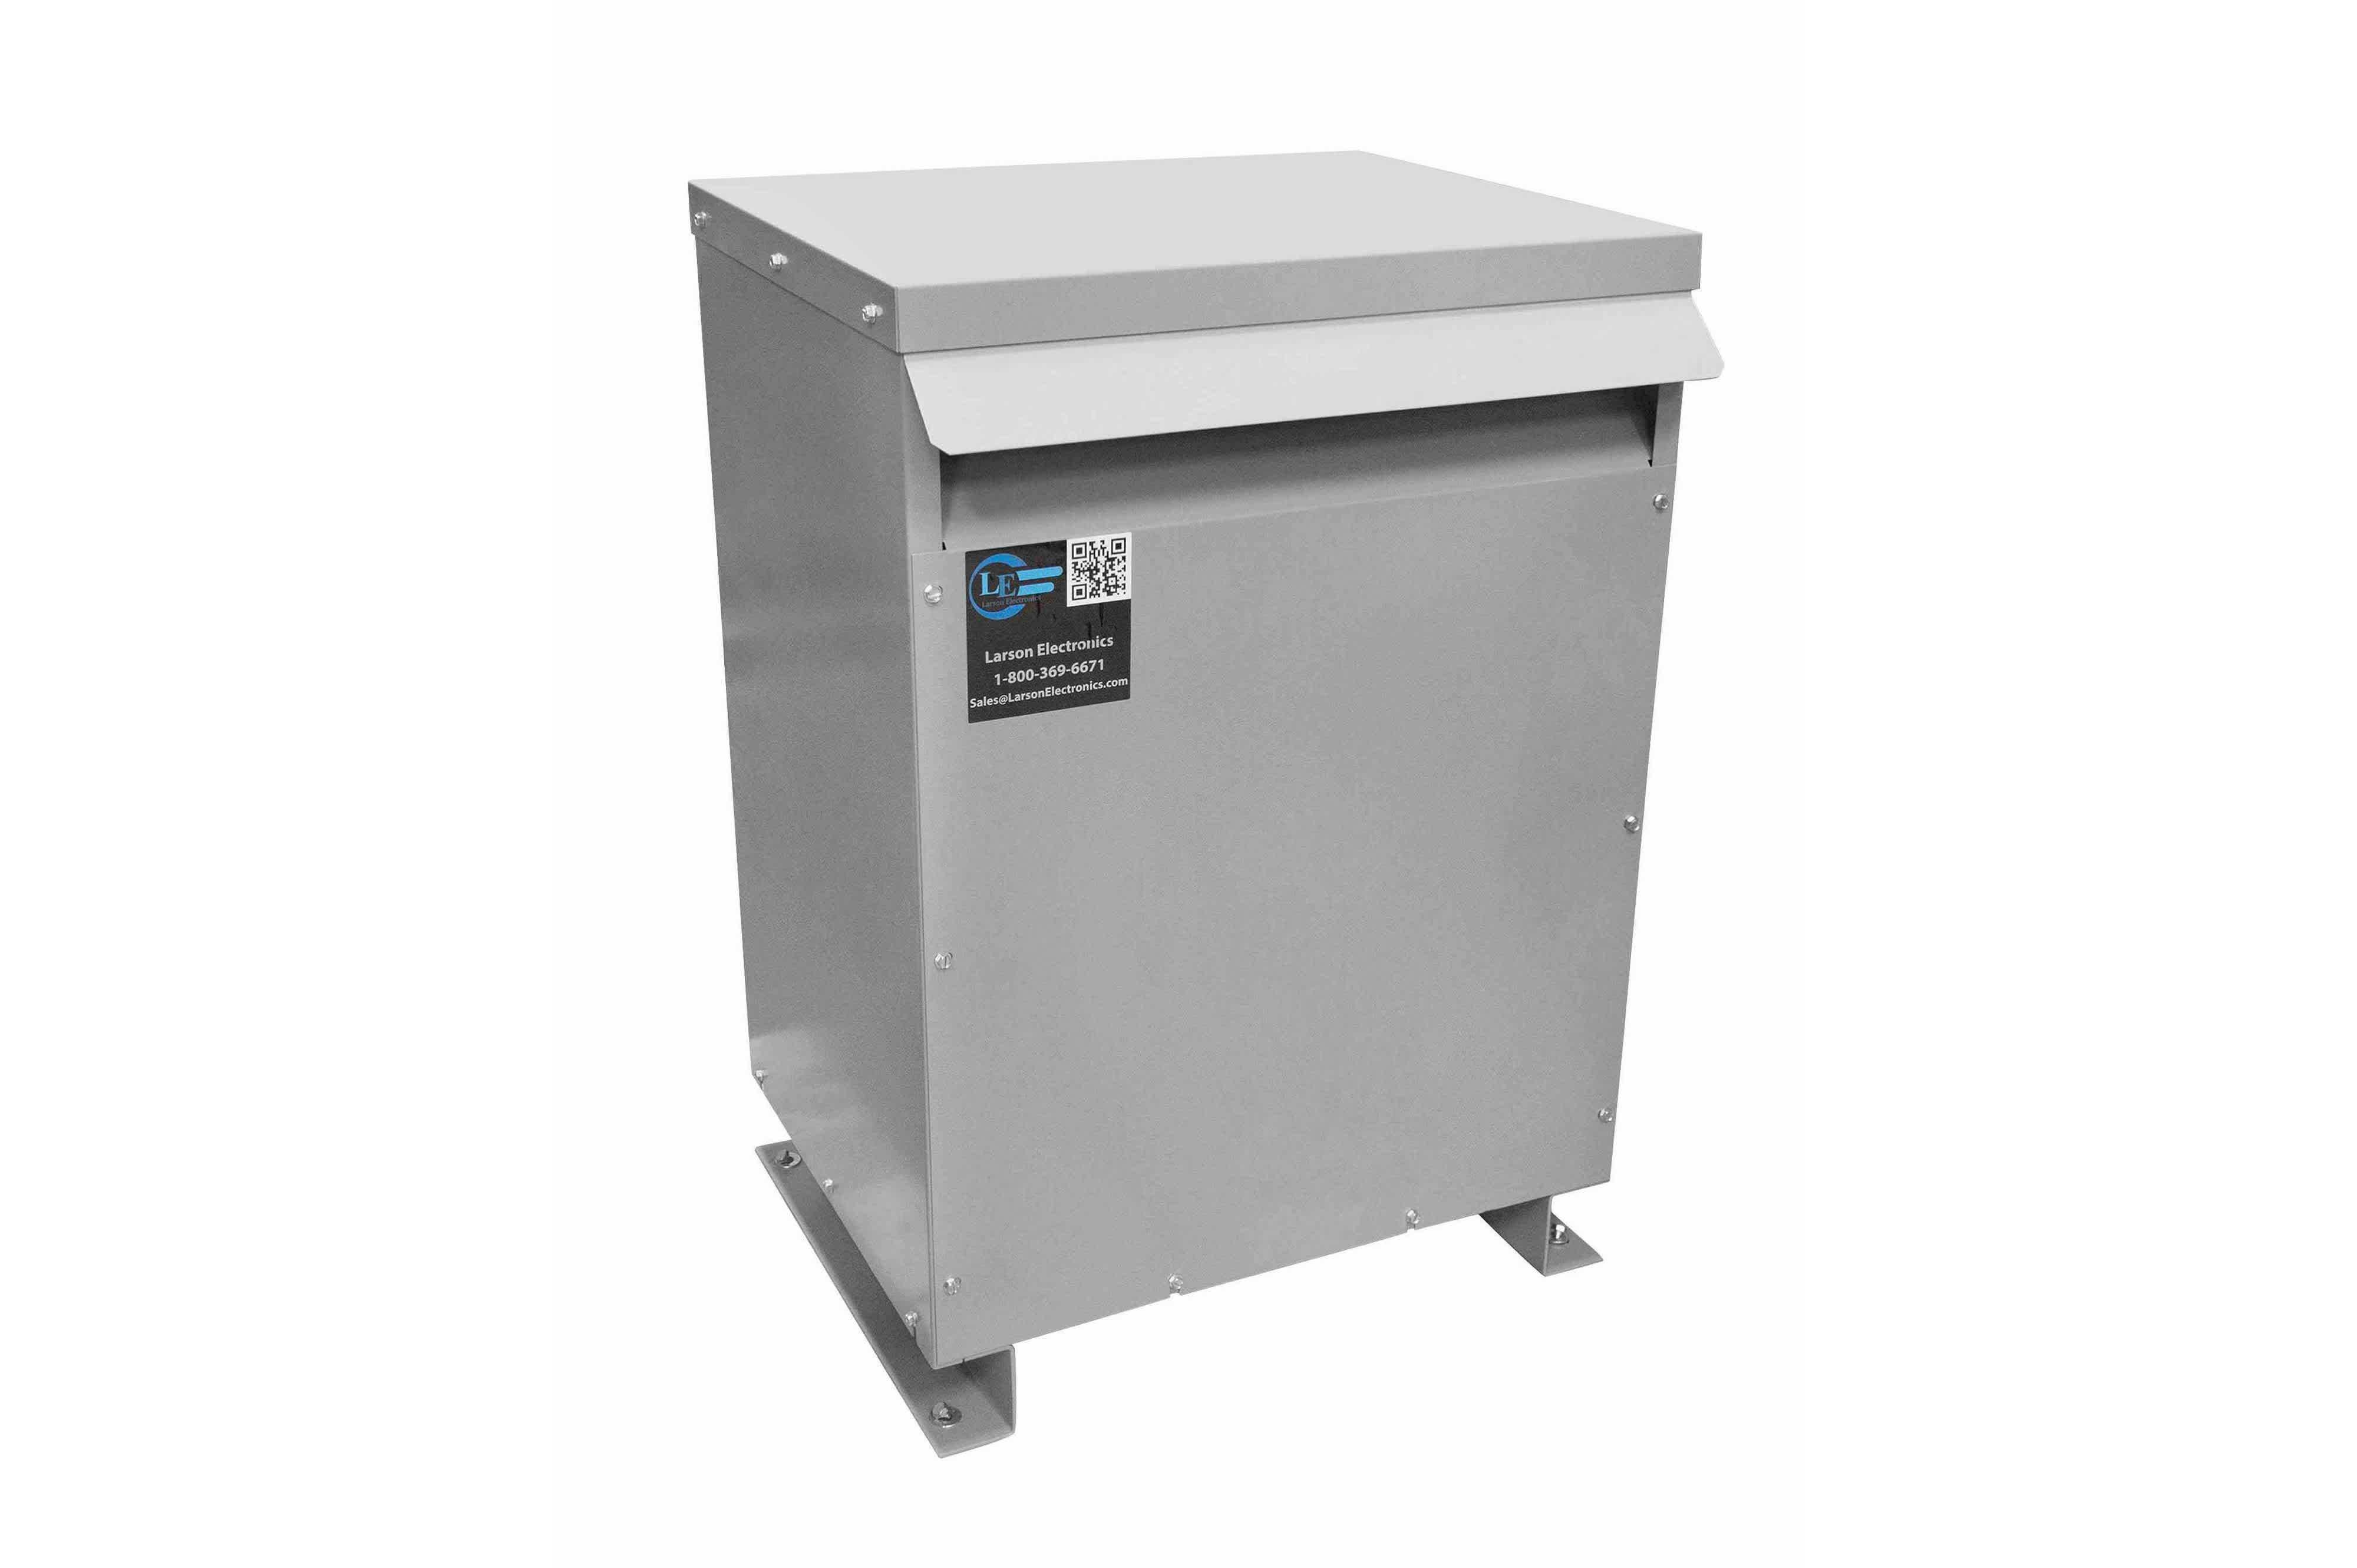 750 kVA 3PH DOE Transformer, 460V Delta Primary, 575Y/332 Wye-N Secondary, N3R, Ventilated, 60 Hz